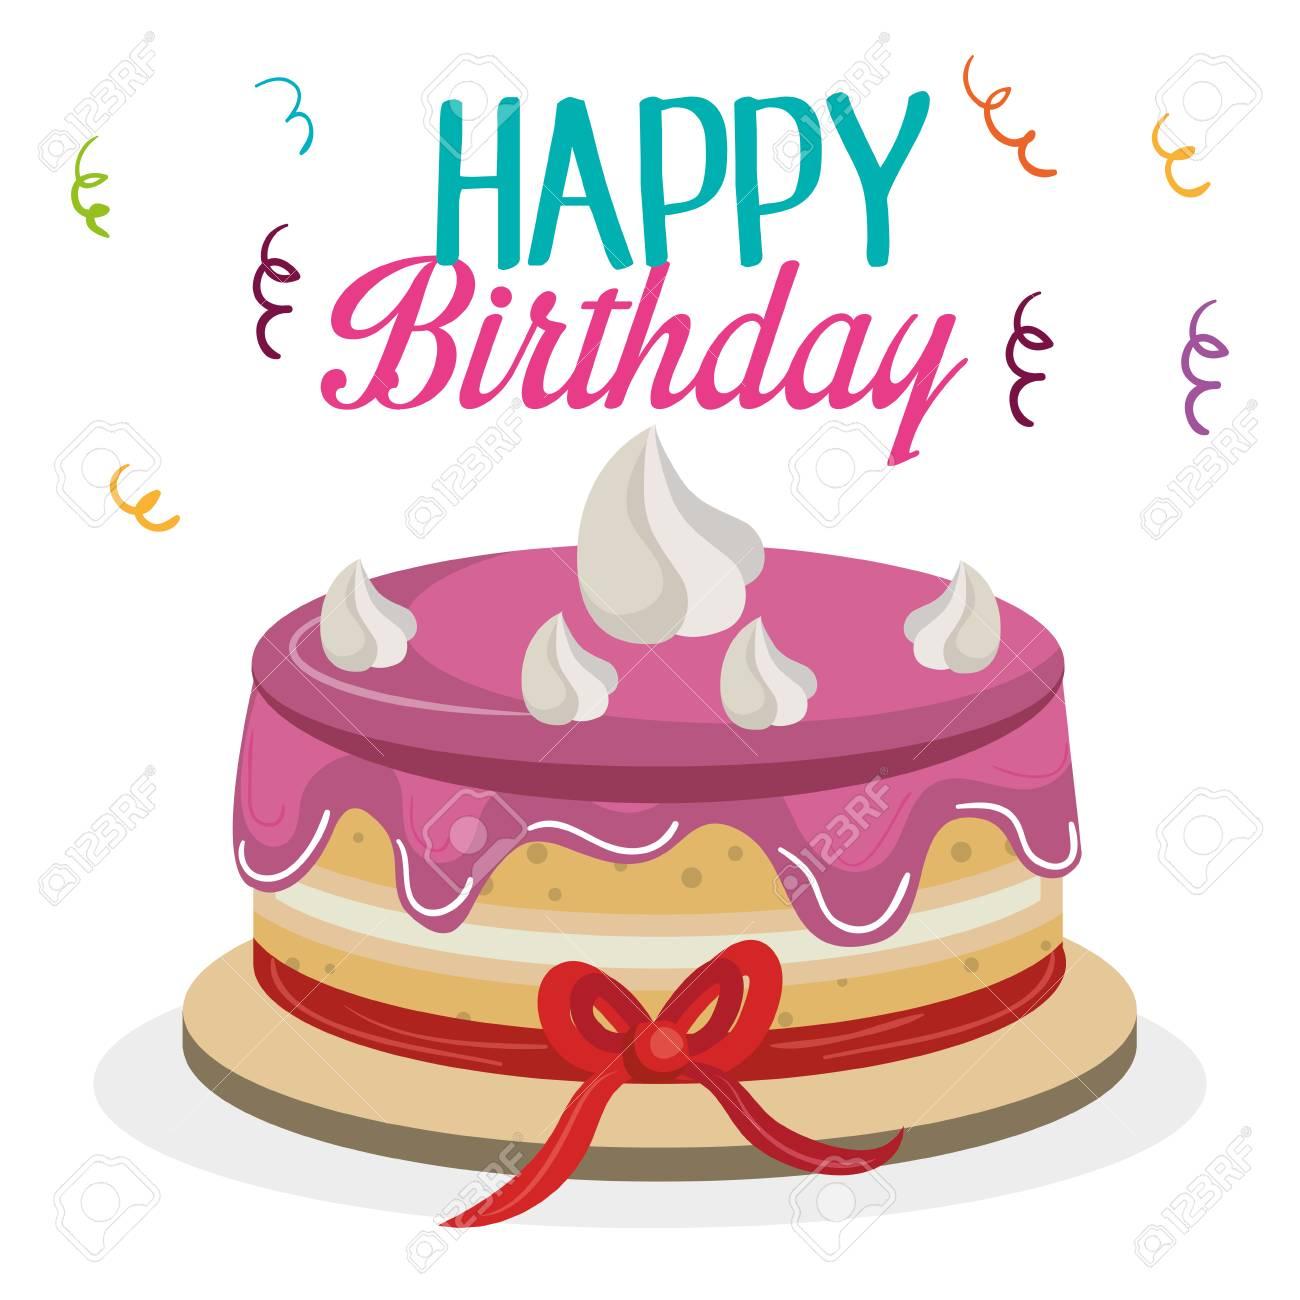 Awe Inspiring Happy Birthday Card With Sweet Cake Vector Illustration Design Funny Birthday Cards Online Benoljebrpdamsfinfo